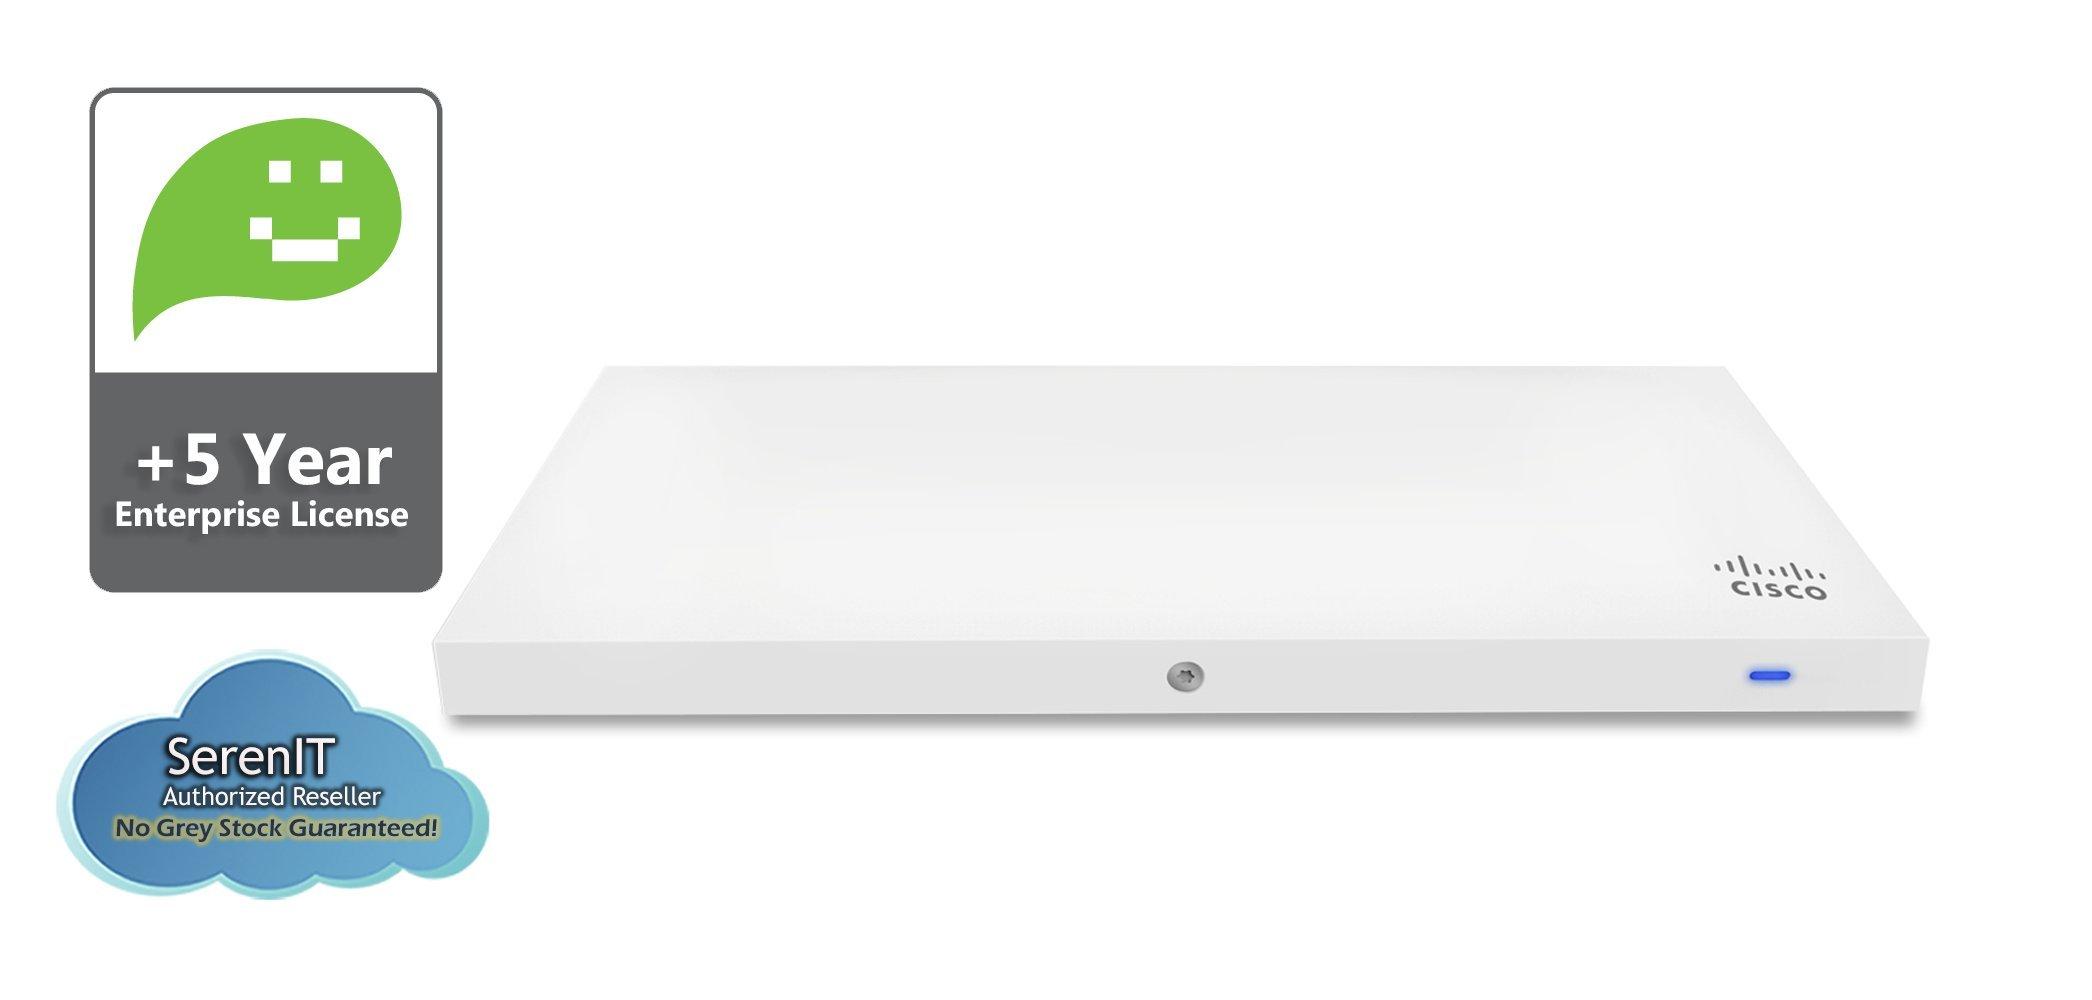 Cisco Meraki MR33 Quad-Radio 802.11ac Wave 2 Access Point, 1.3 Gbps, 802.3af PoE with 5 Years Enterprise License by Meraki (Image #1)